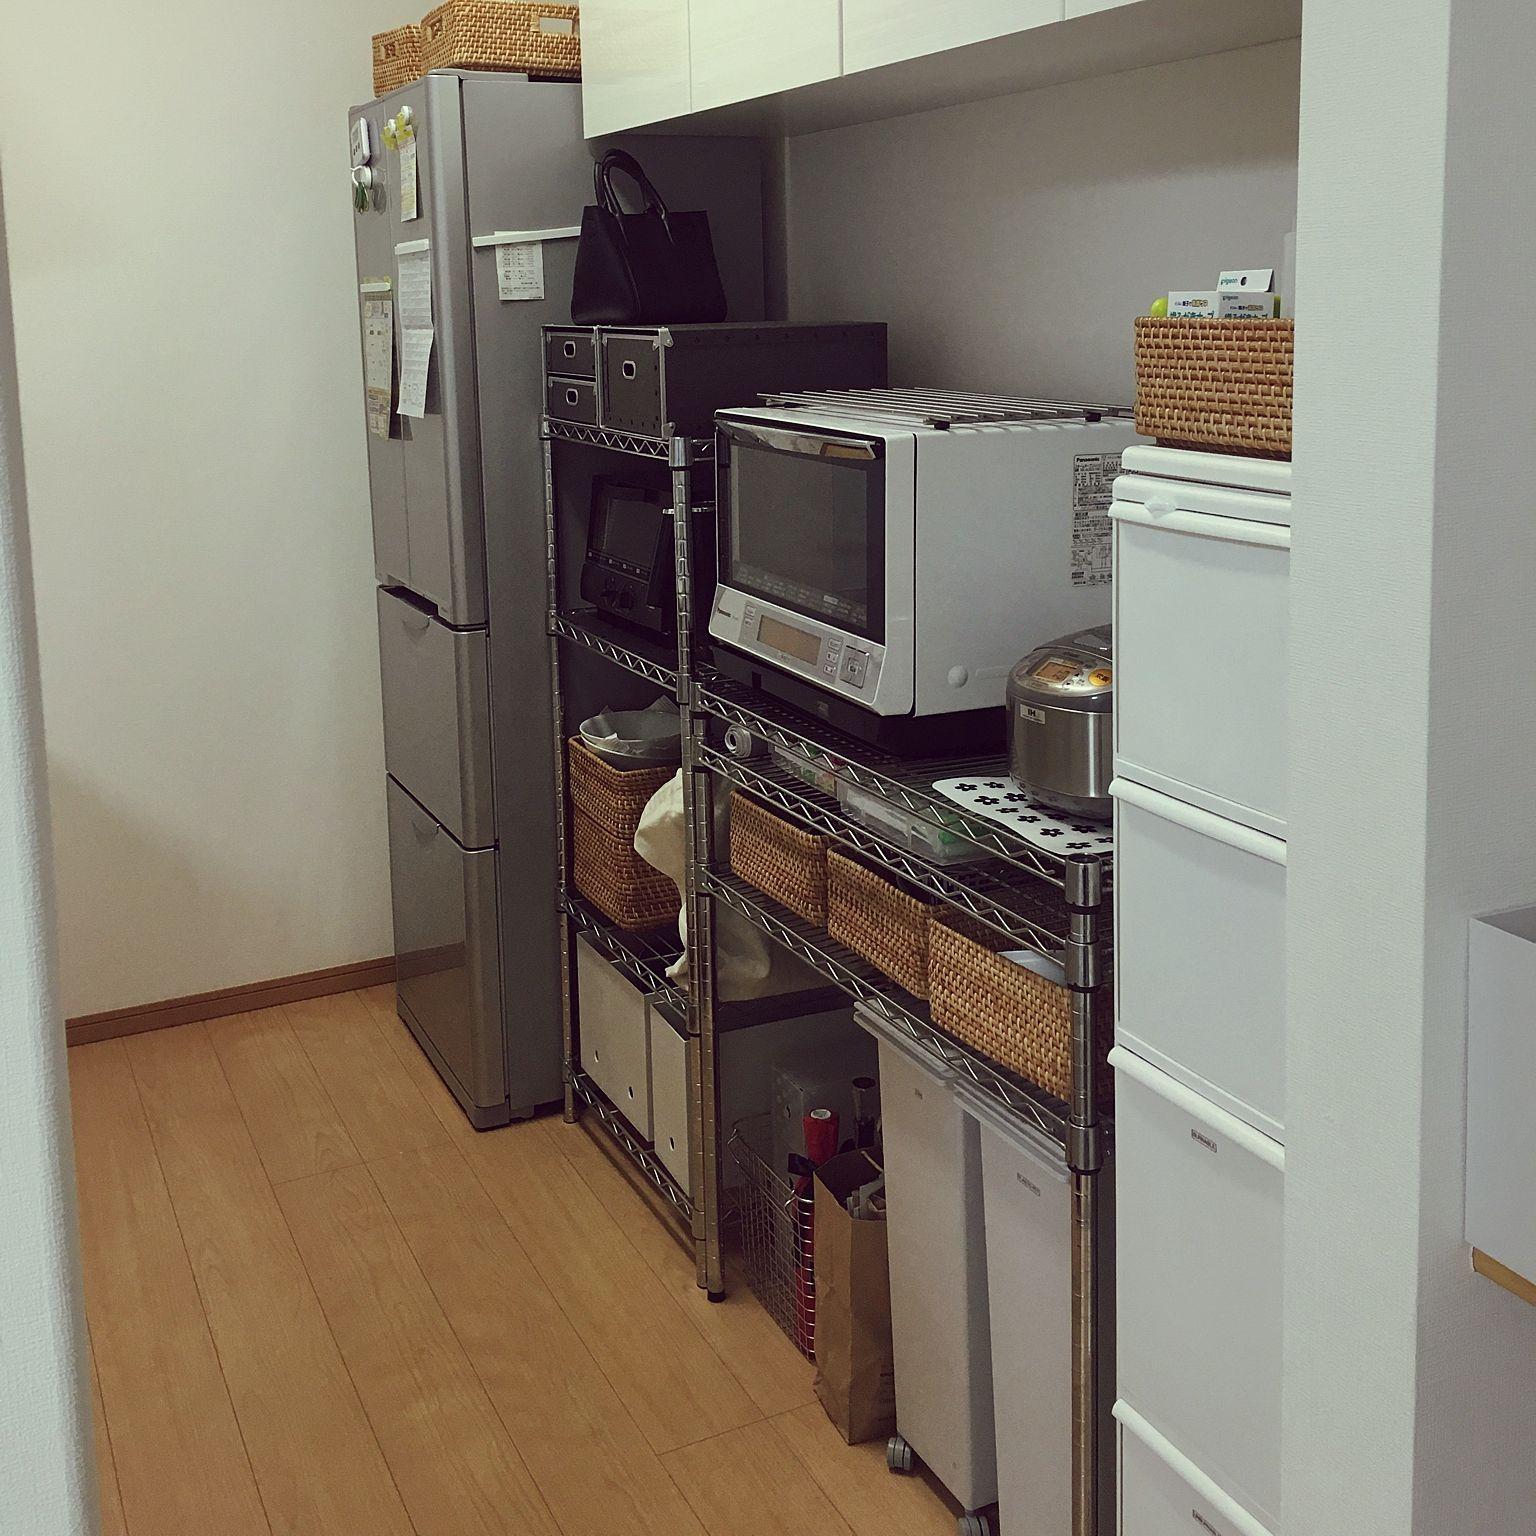 kitchen/無印良品/建売/ラック/スチールラック/キッチン収納…などの